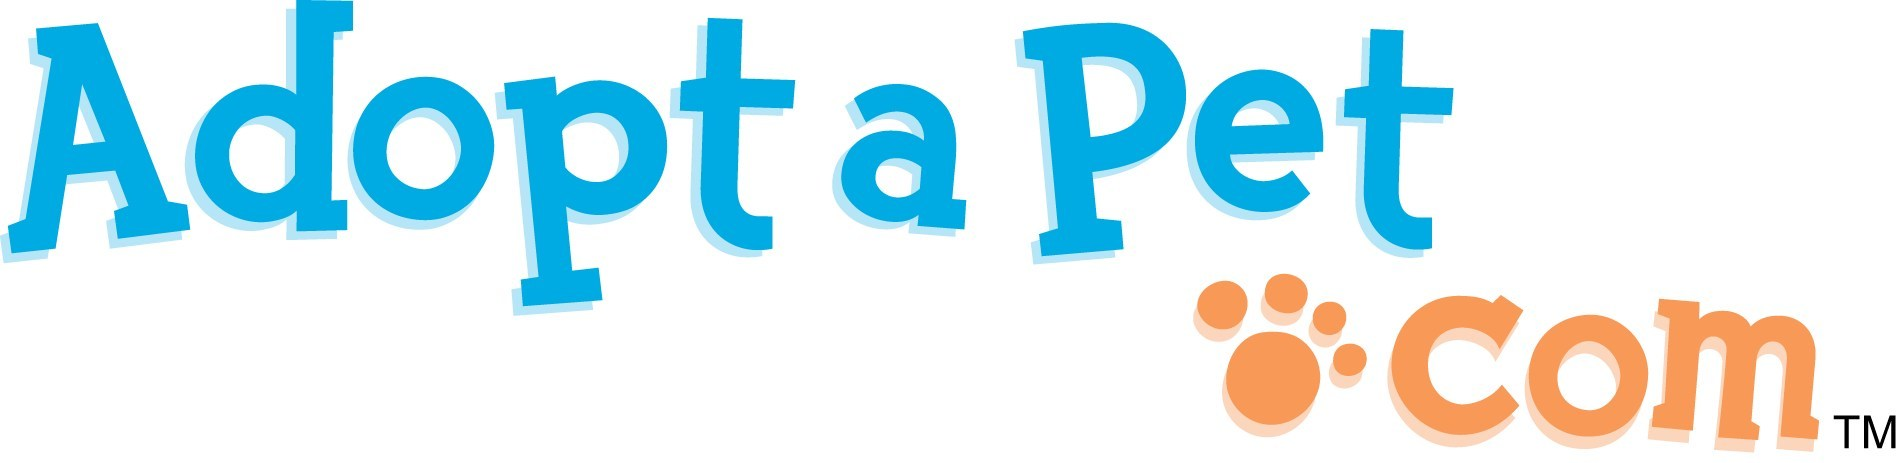 Adopt-a-Pet.com launches Foster a Hurricane Pet (www.fosterahurricanepet.org) (PRNewsfoto/Adopt-a-Pet.com)